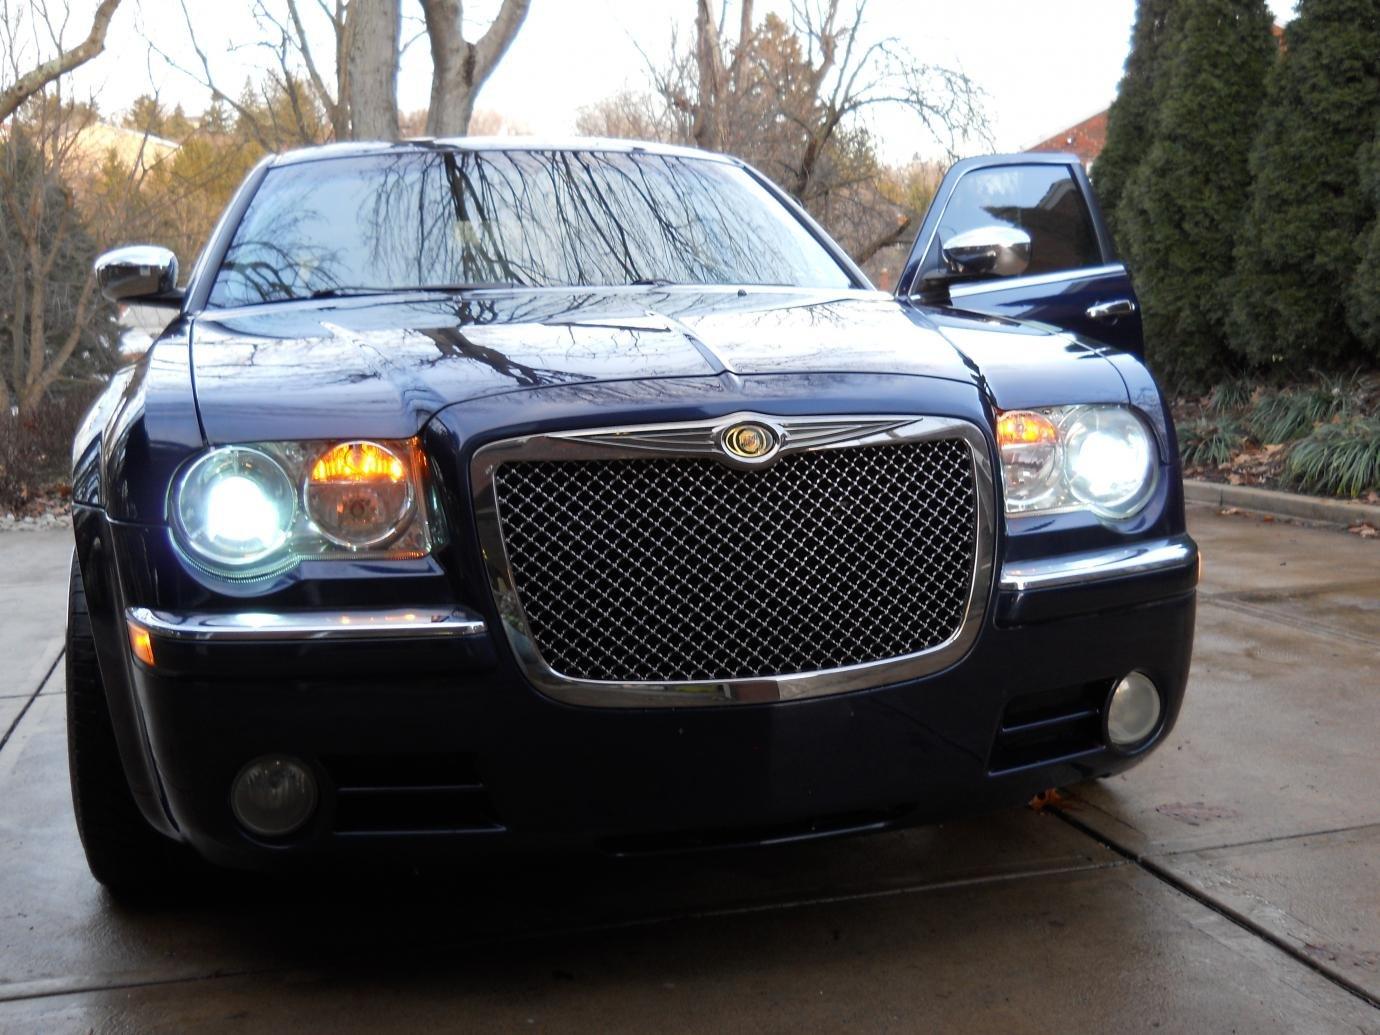 Worksheet. EXPIRED 2005 300c hemi awd  Chrysler 300C Forum 300C  SRT8 Forums